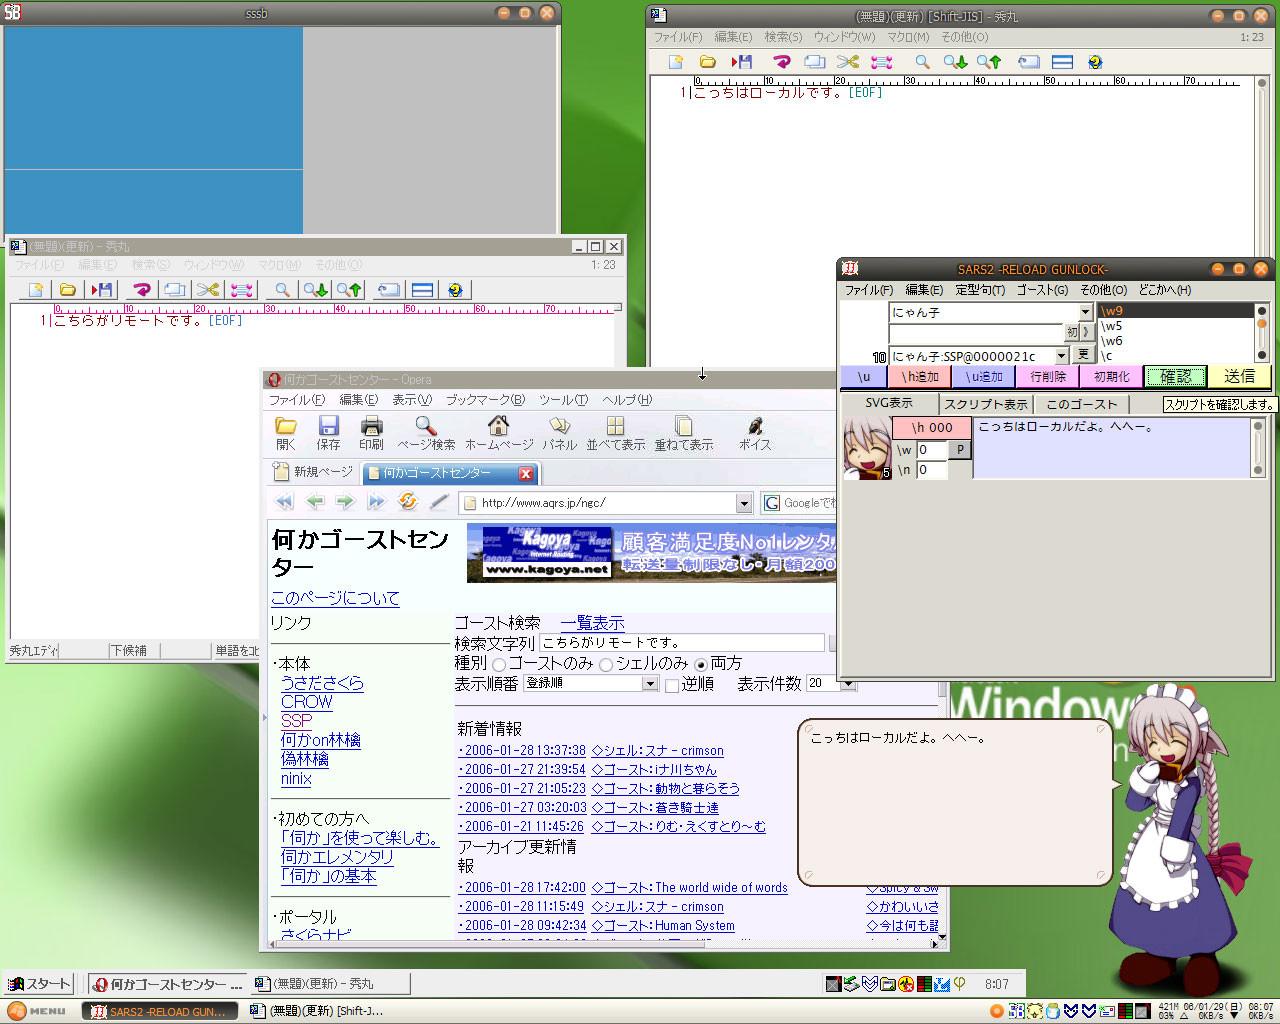 f:id:aobanozomi:20060129085711j:image:w320